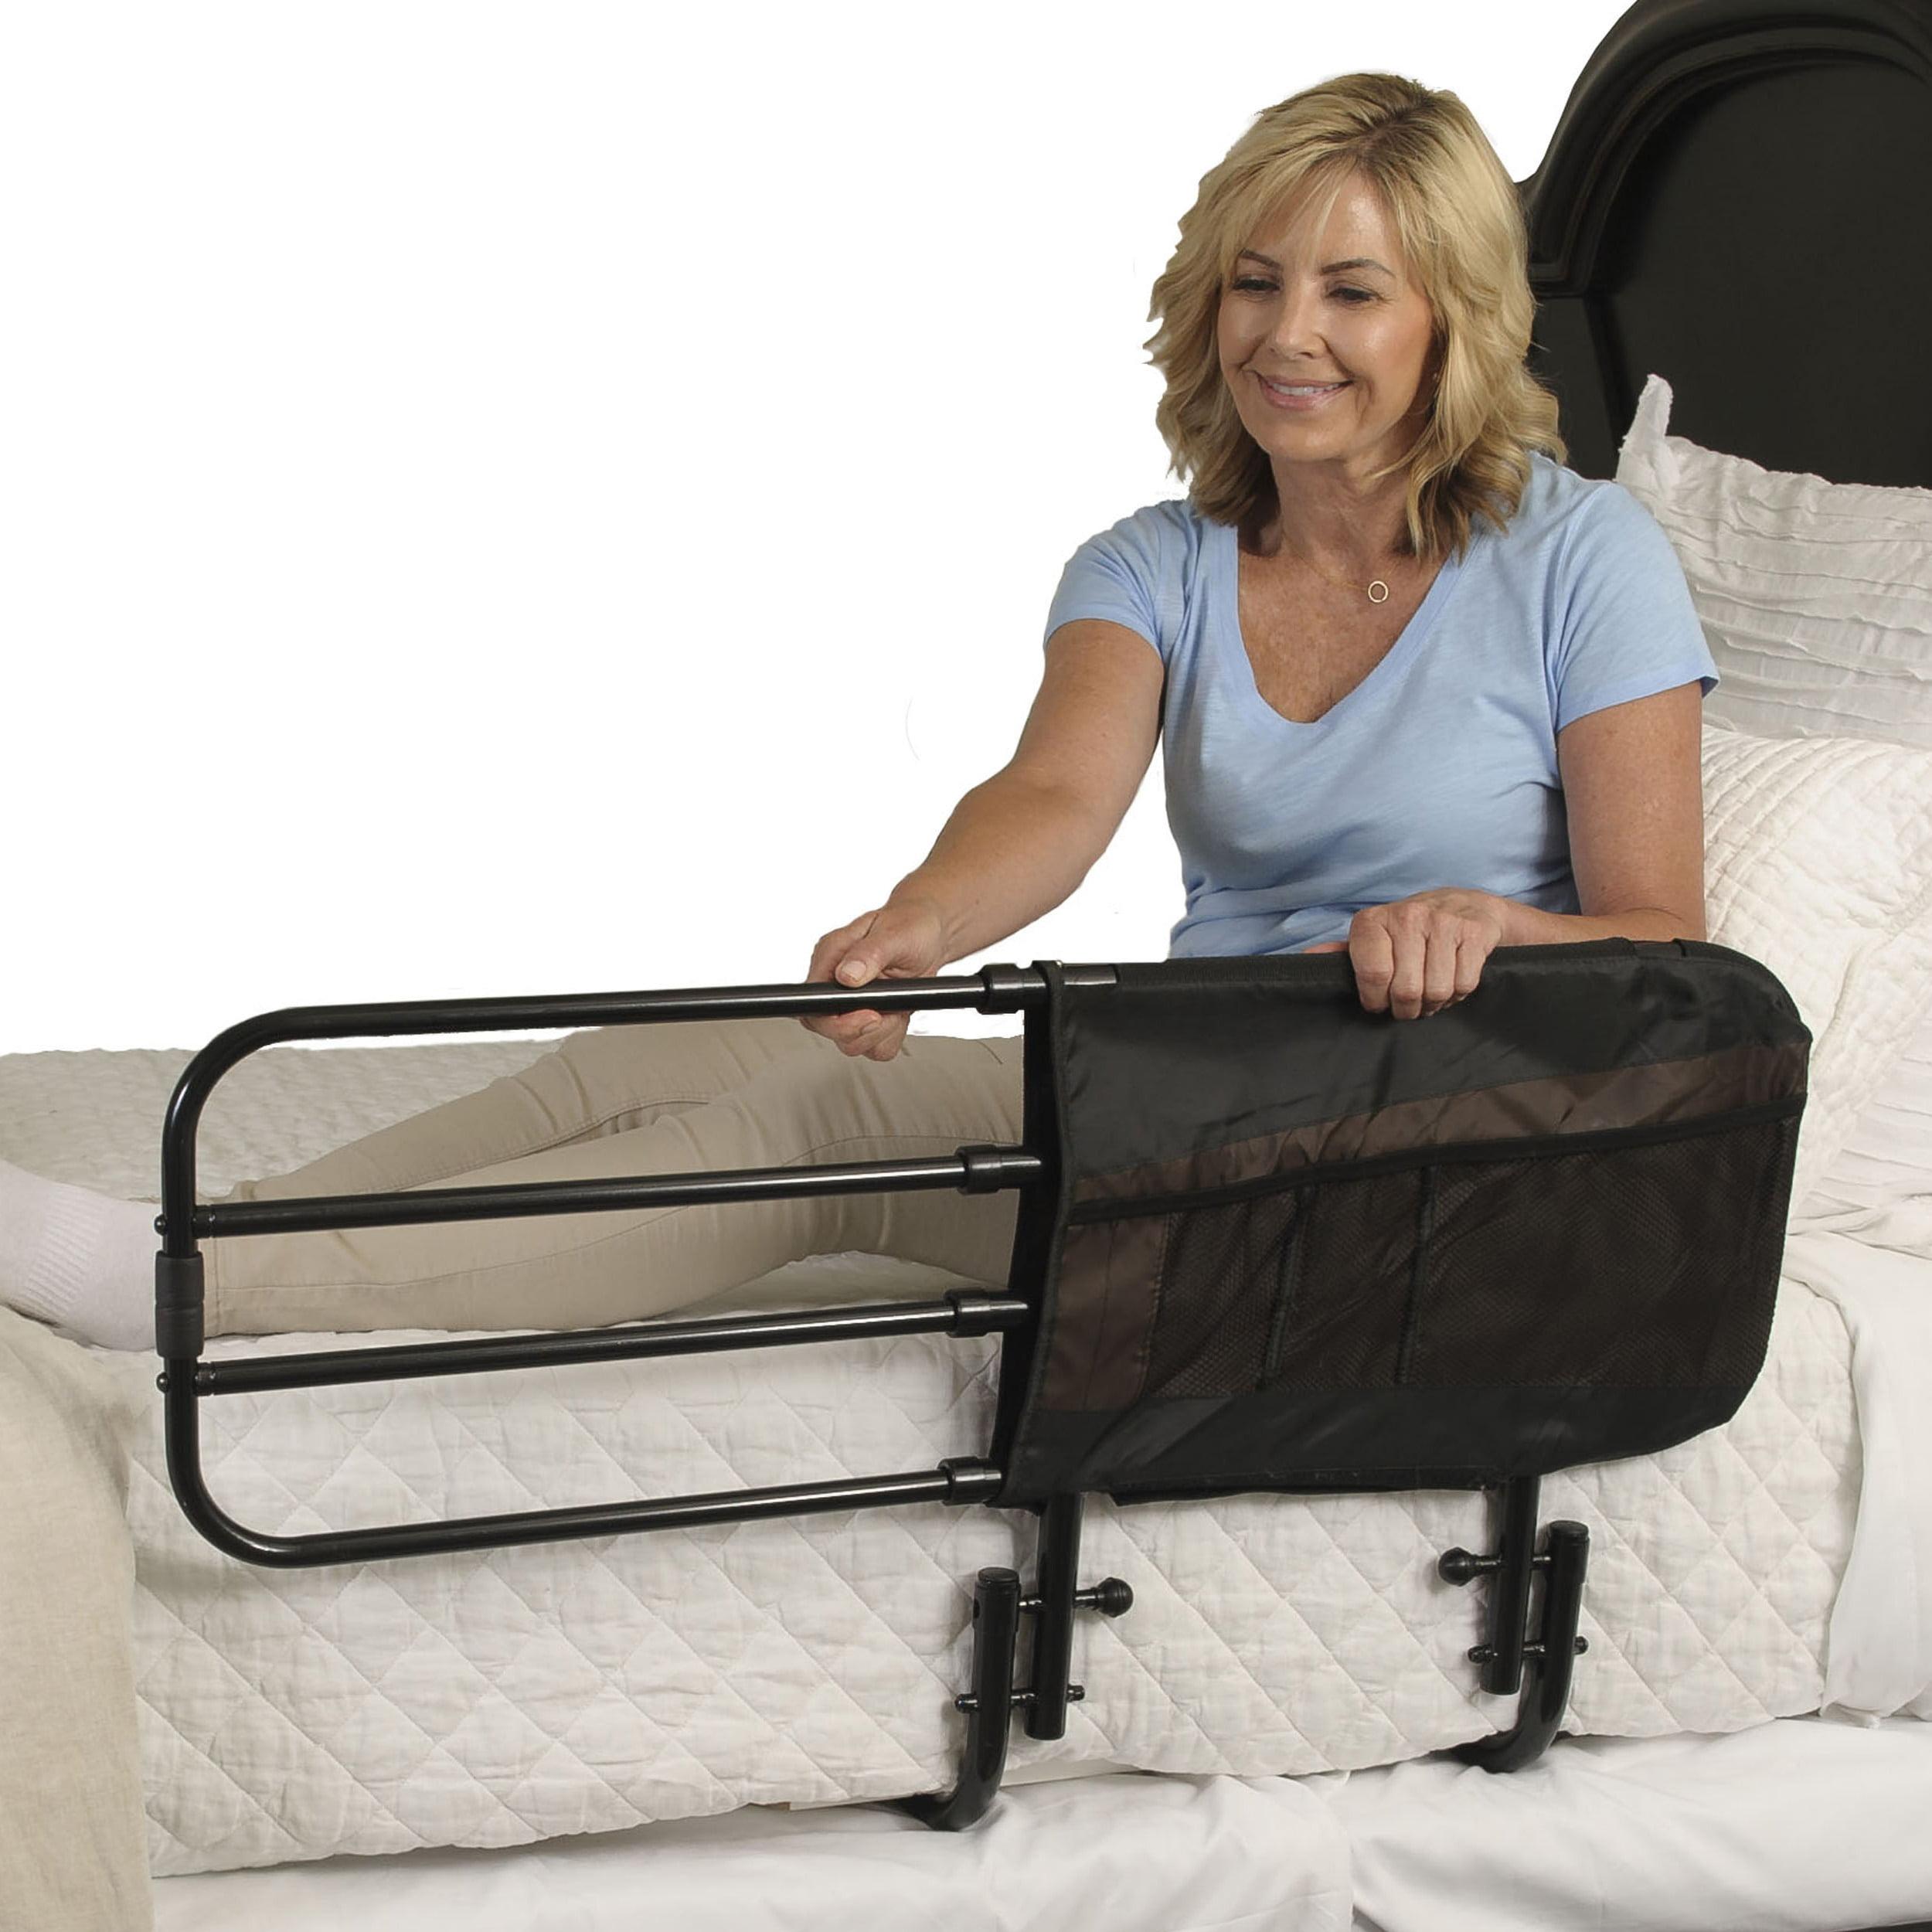 Stander Ez Adjust Bed Rail Adjustable Adult Bed Rail And Elderly Bed Assist Hand Rail For Seniors Walmart Com Walmart Com